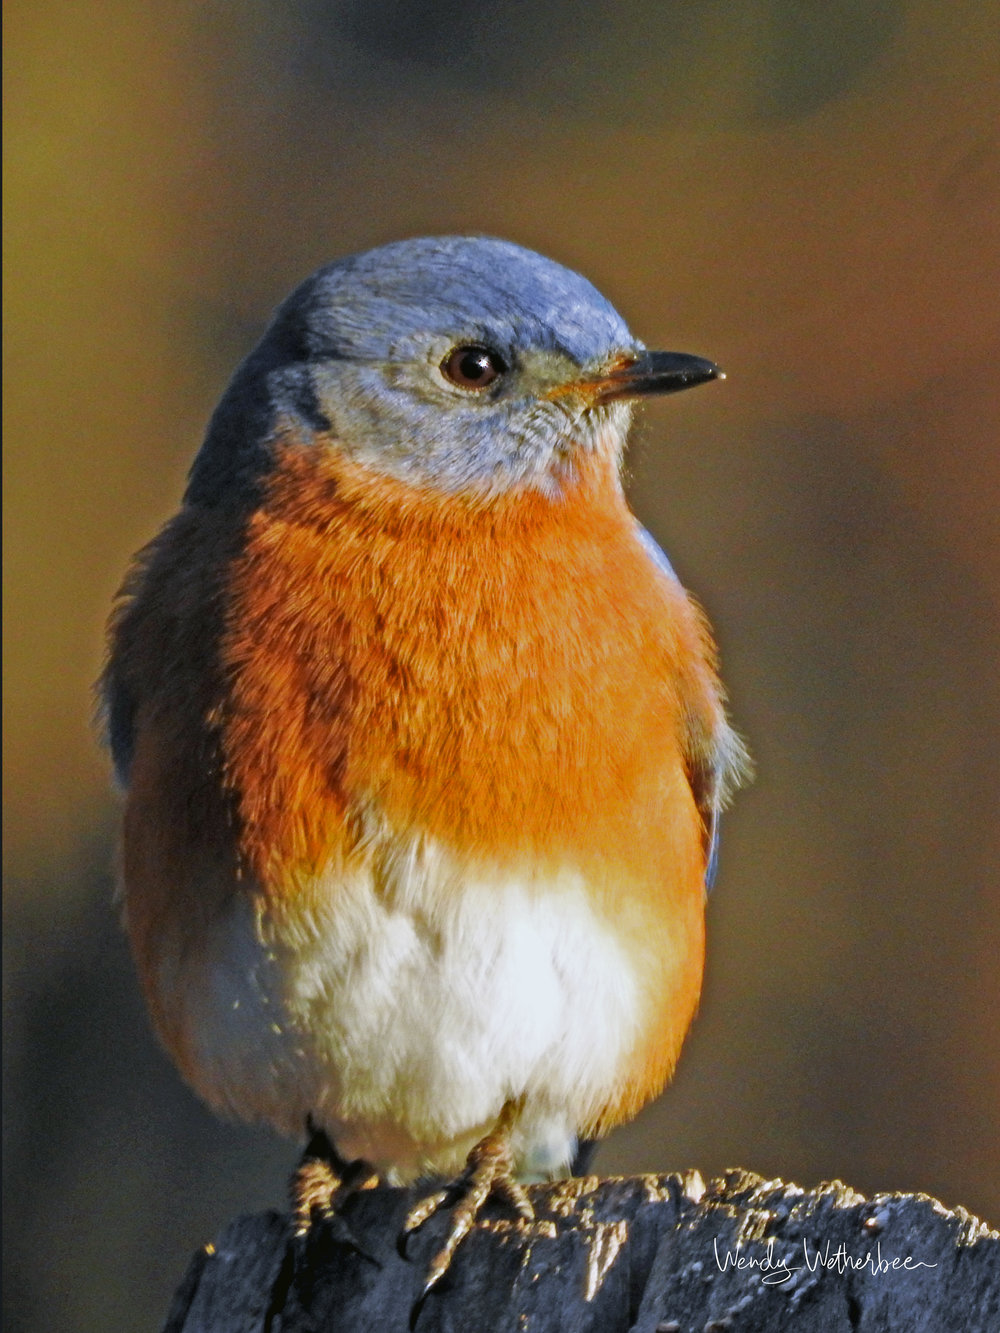 Portrait of a Bluebird © Wendy Wetherbee